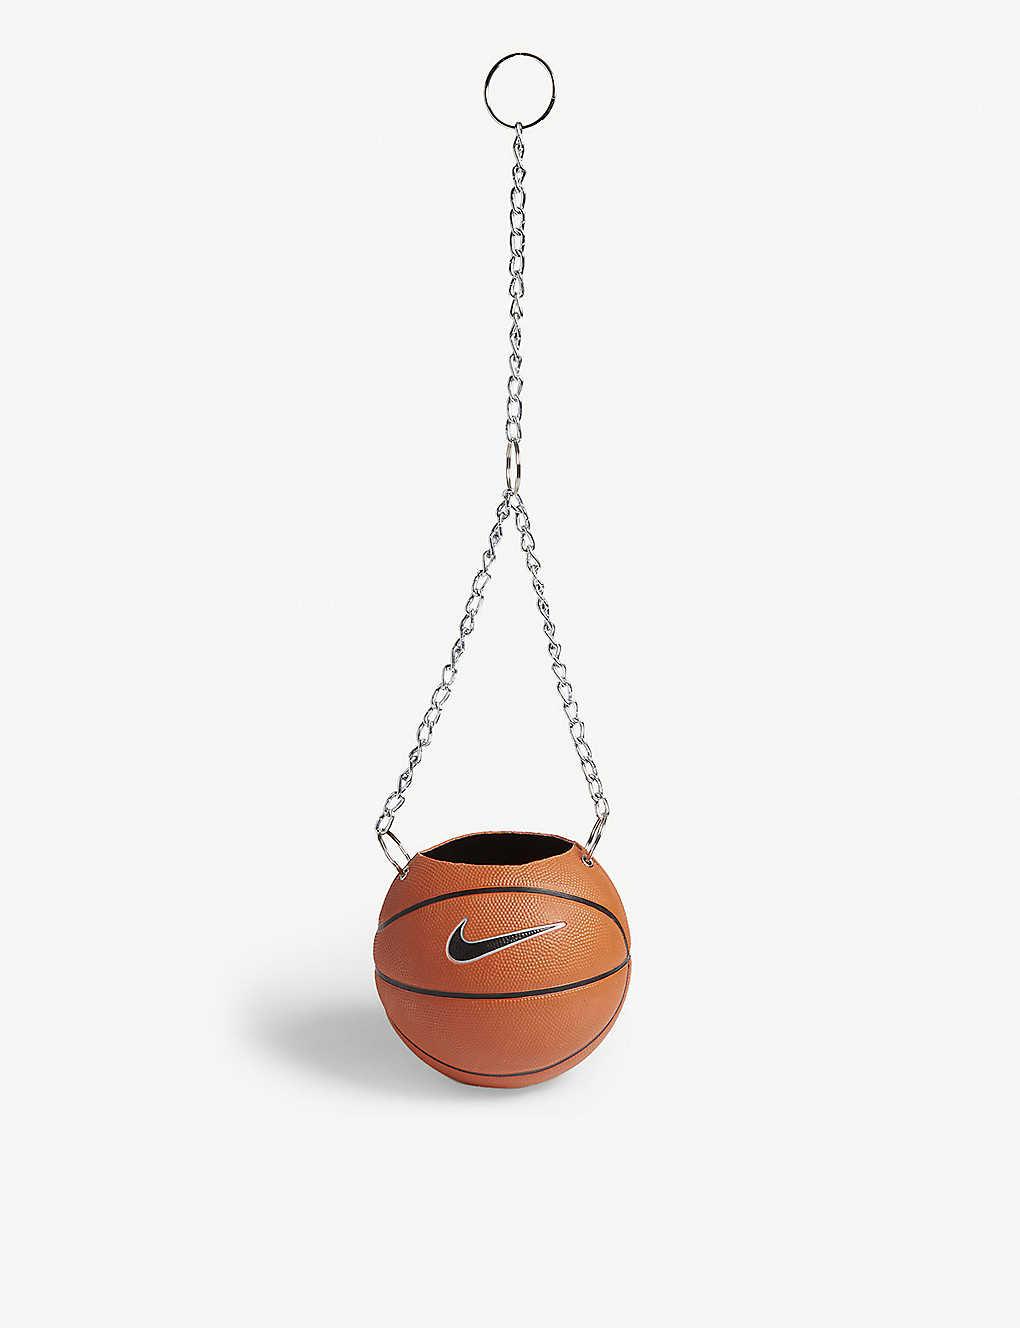 37f3d4f57f BODEGA ROSE - Nike basketball hanging planter   Selfridges.com